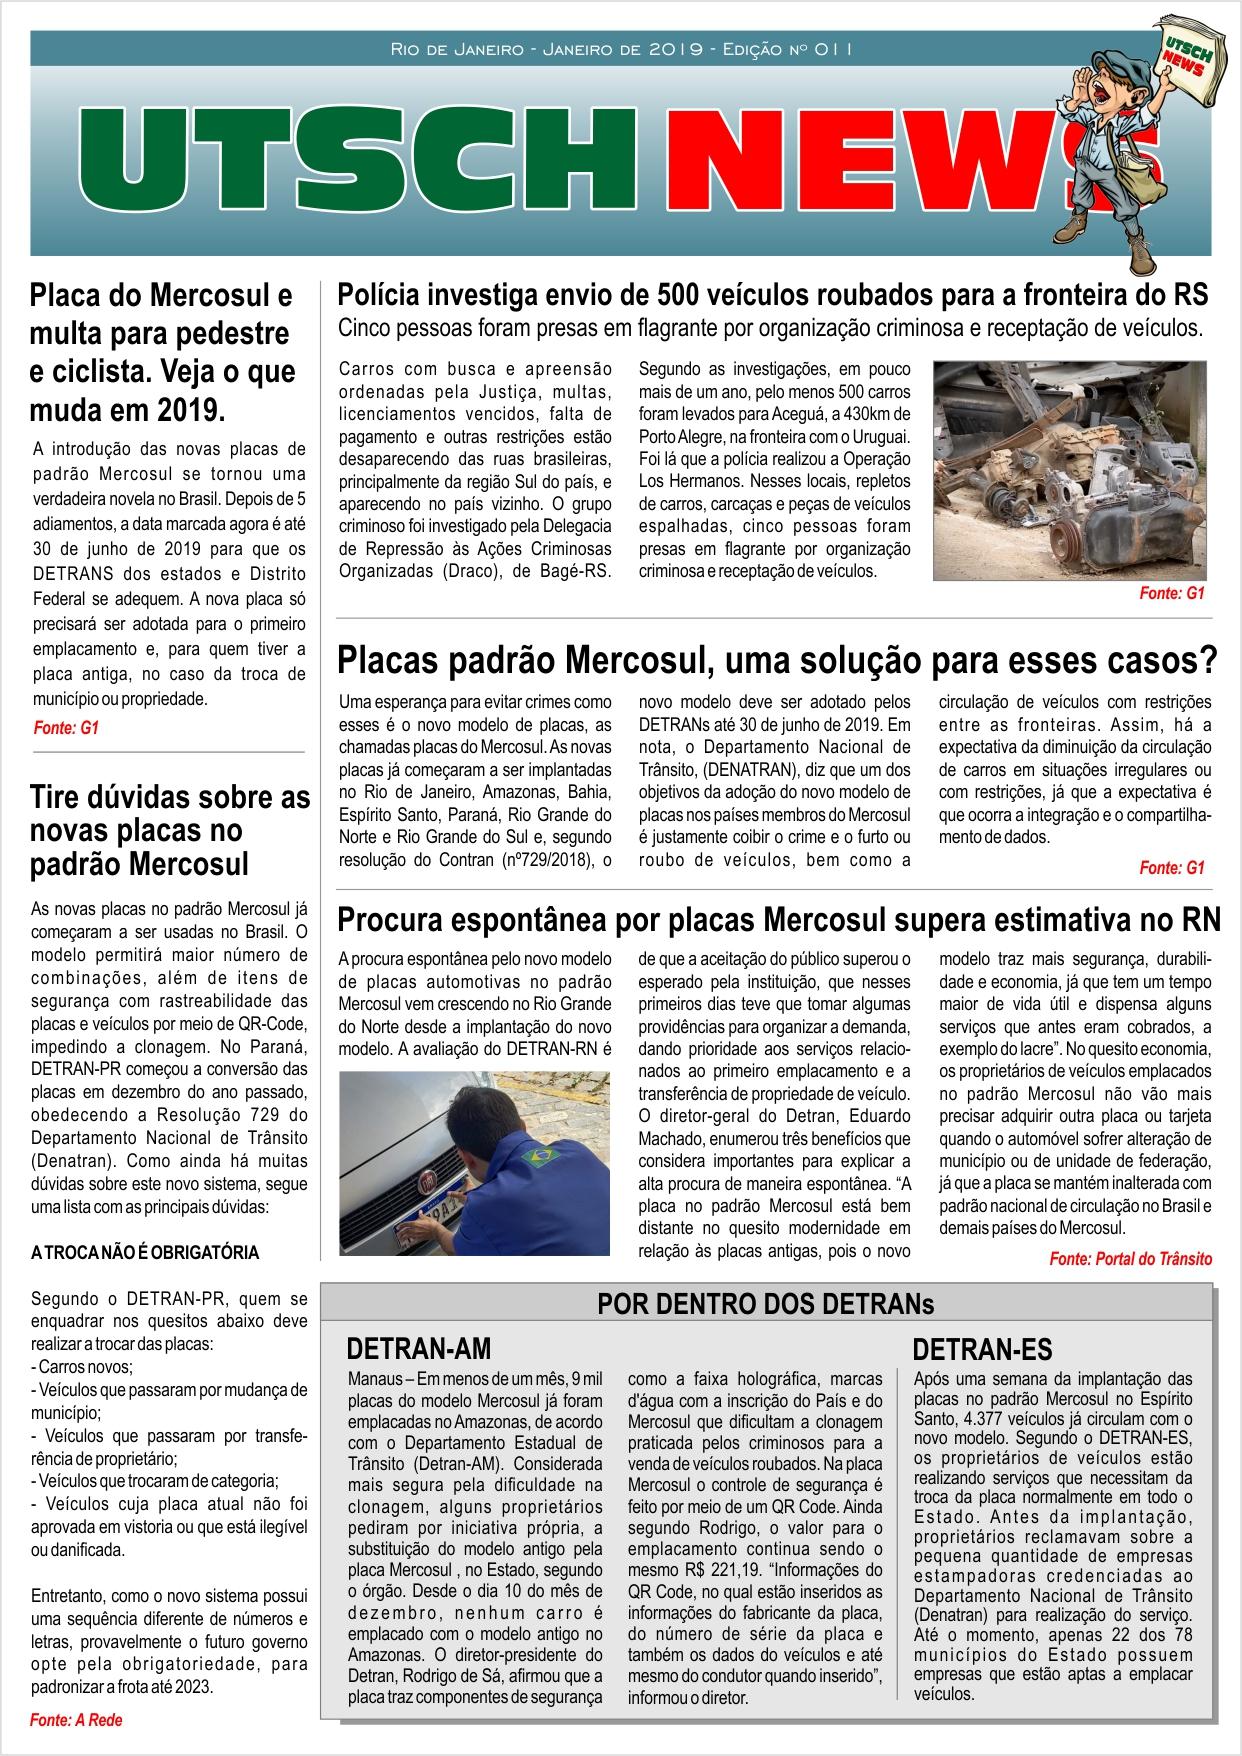 Jornal UTSCH BRASIL - edição 011 - Janeiro_2019